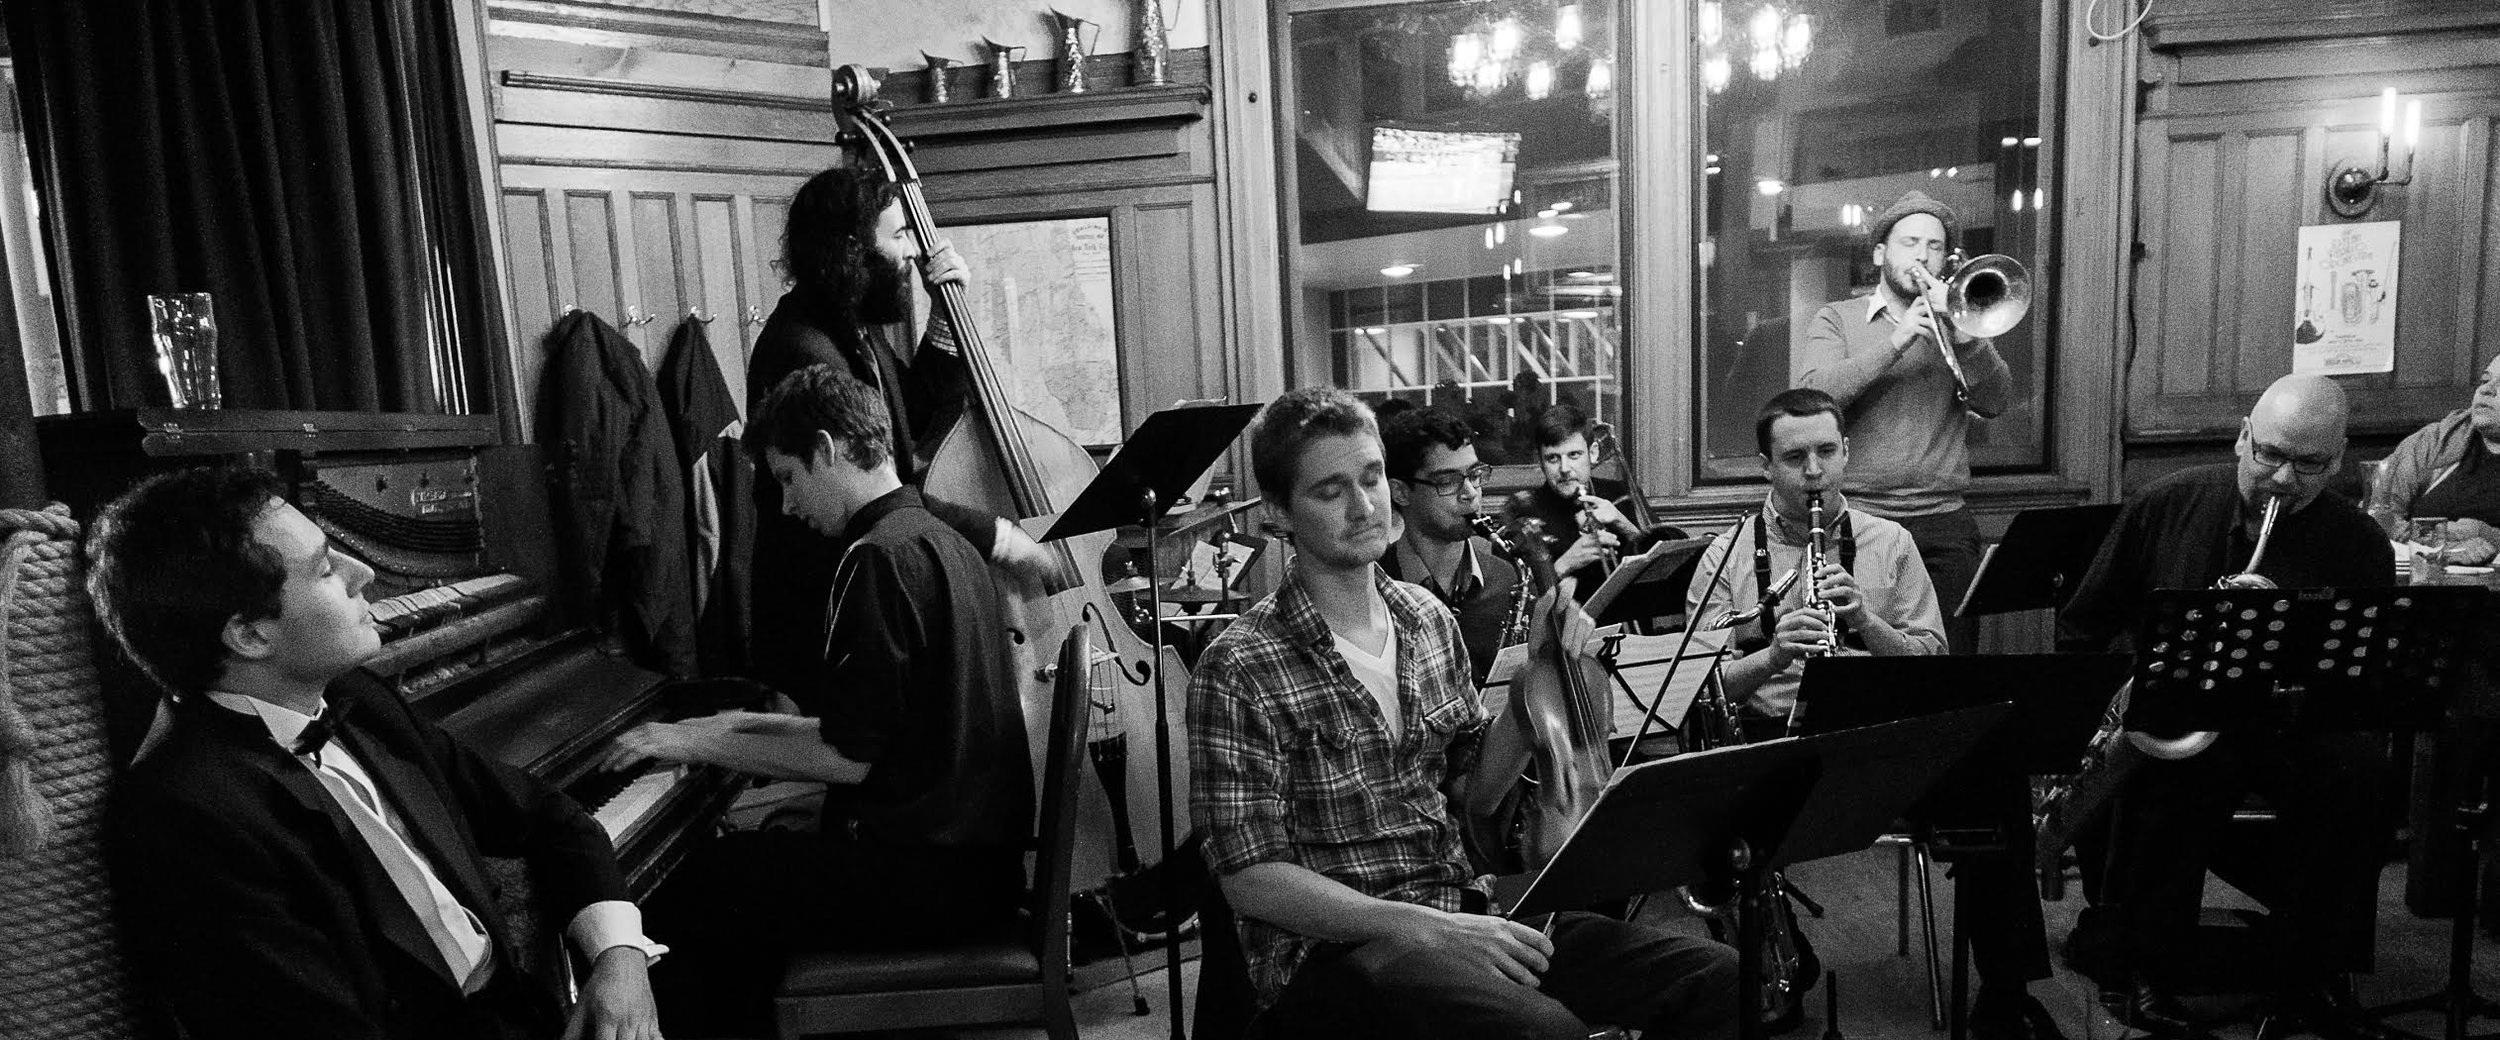 The Dylan Perillo Orchestra